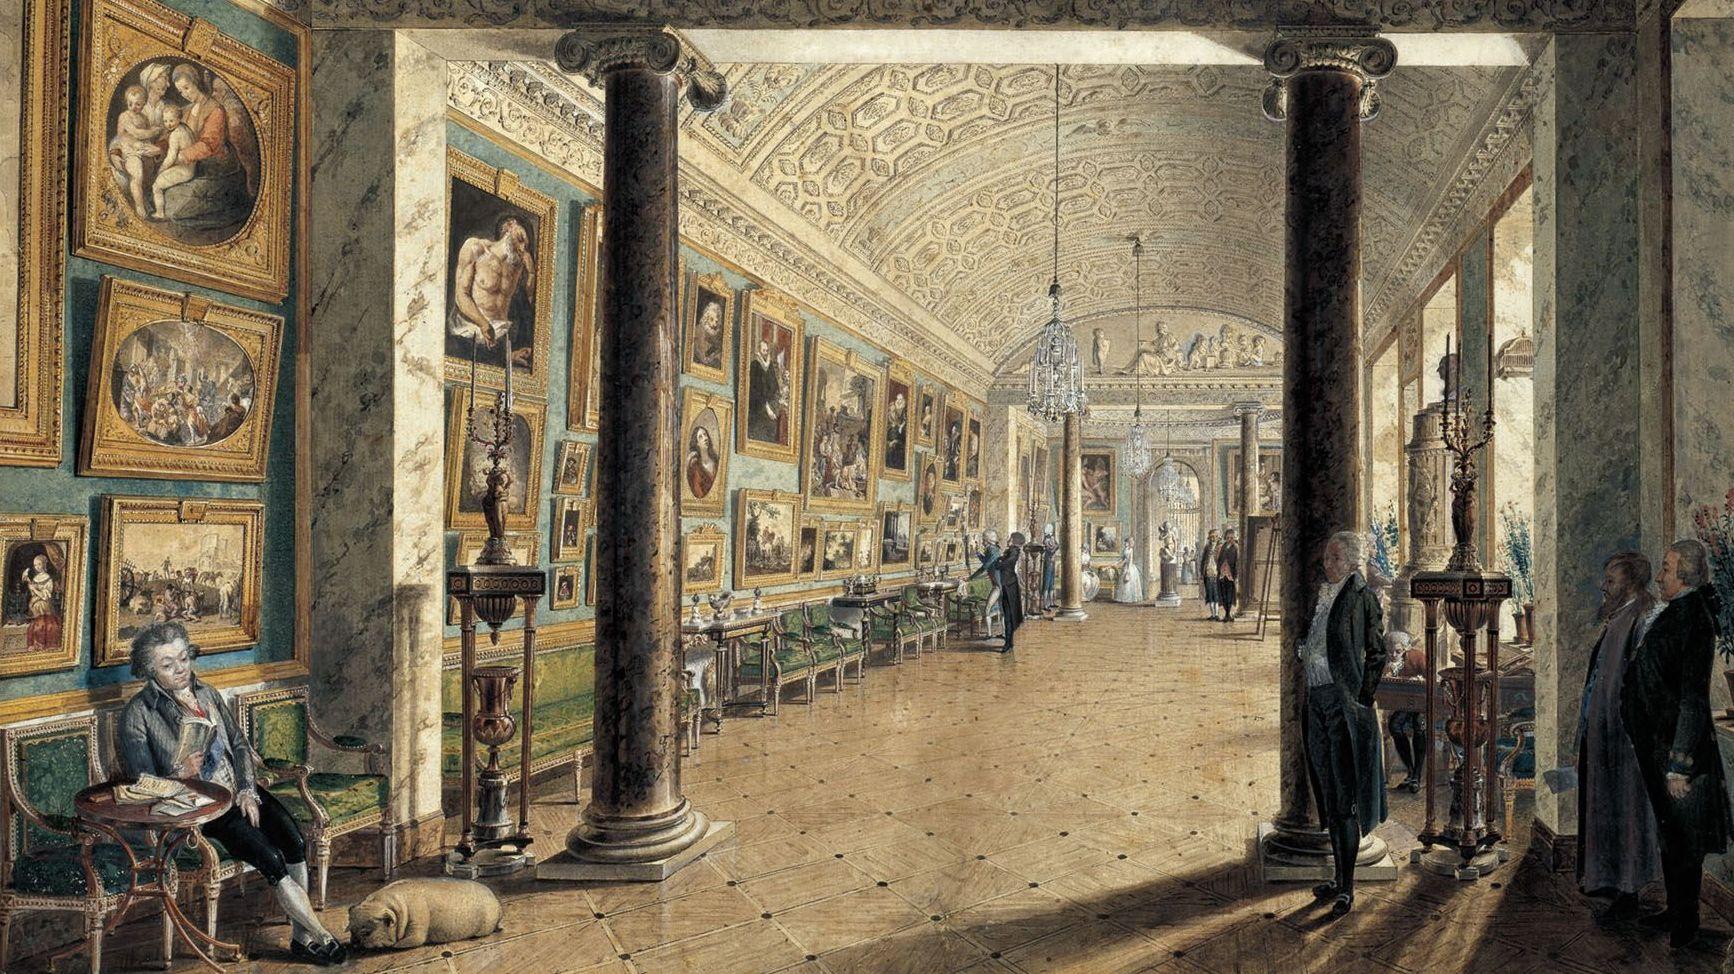 Картинная галерея графа А.С.Строганова, 1794. Воробьев М.Н.